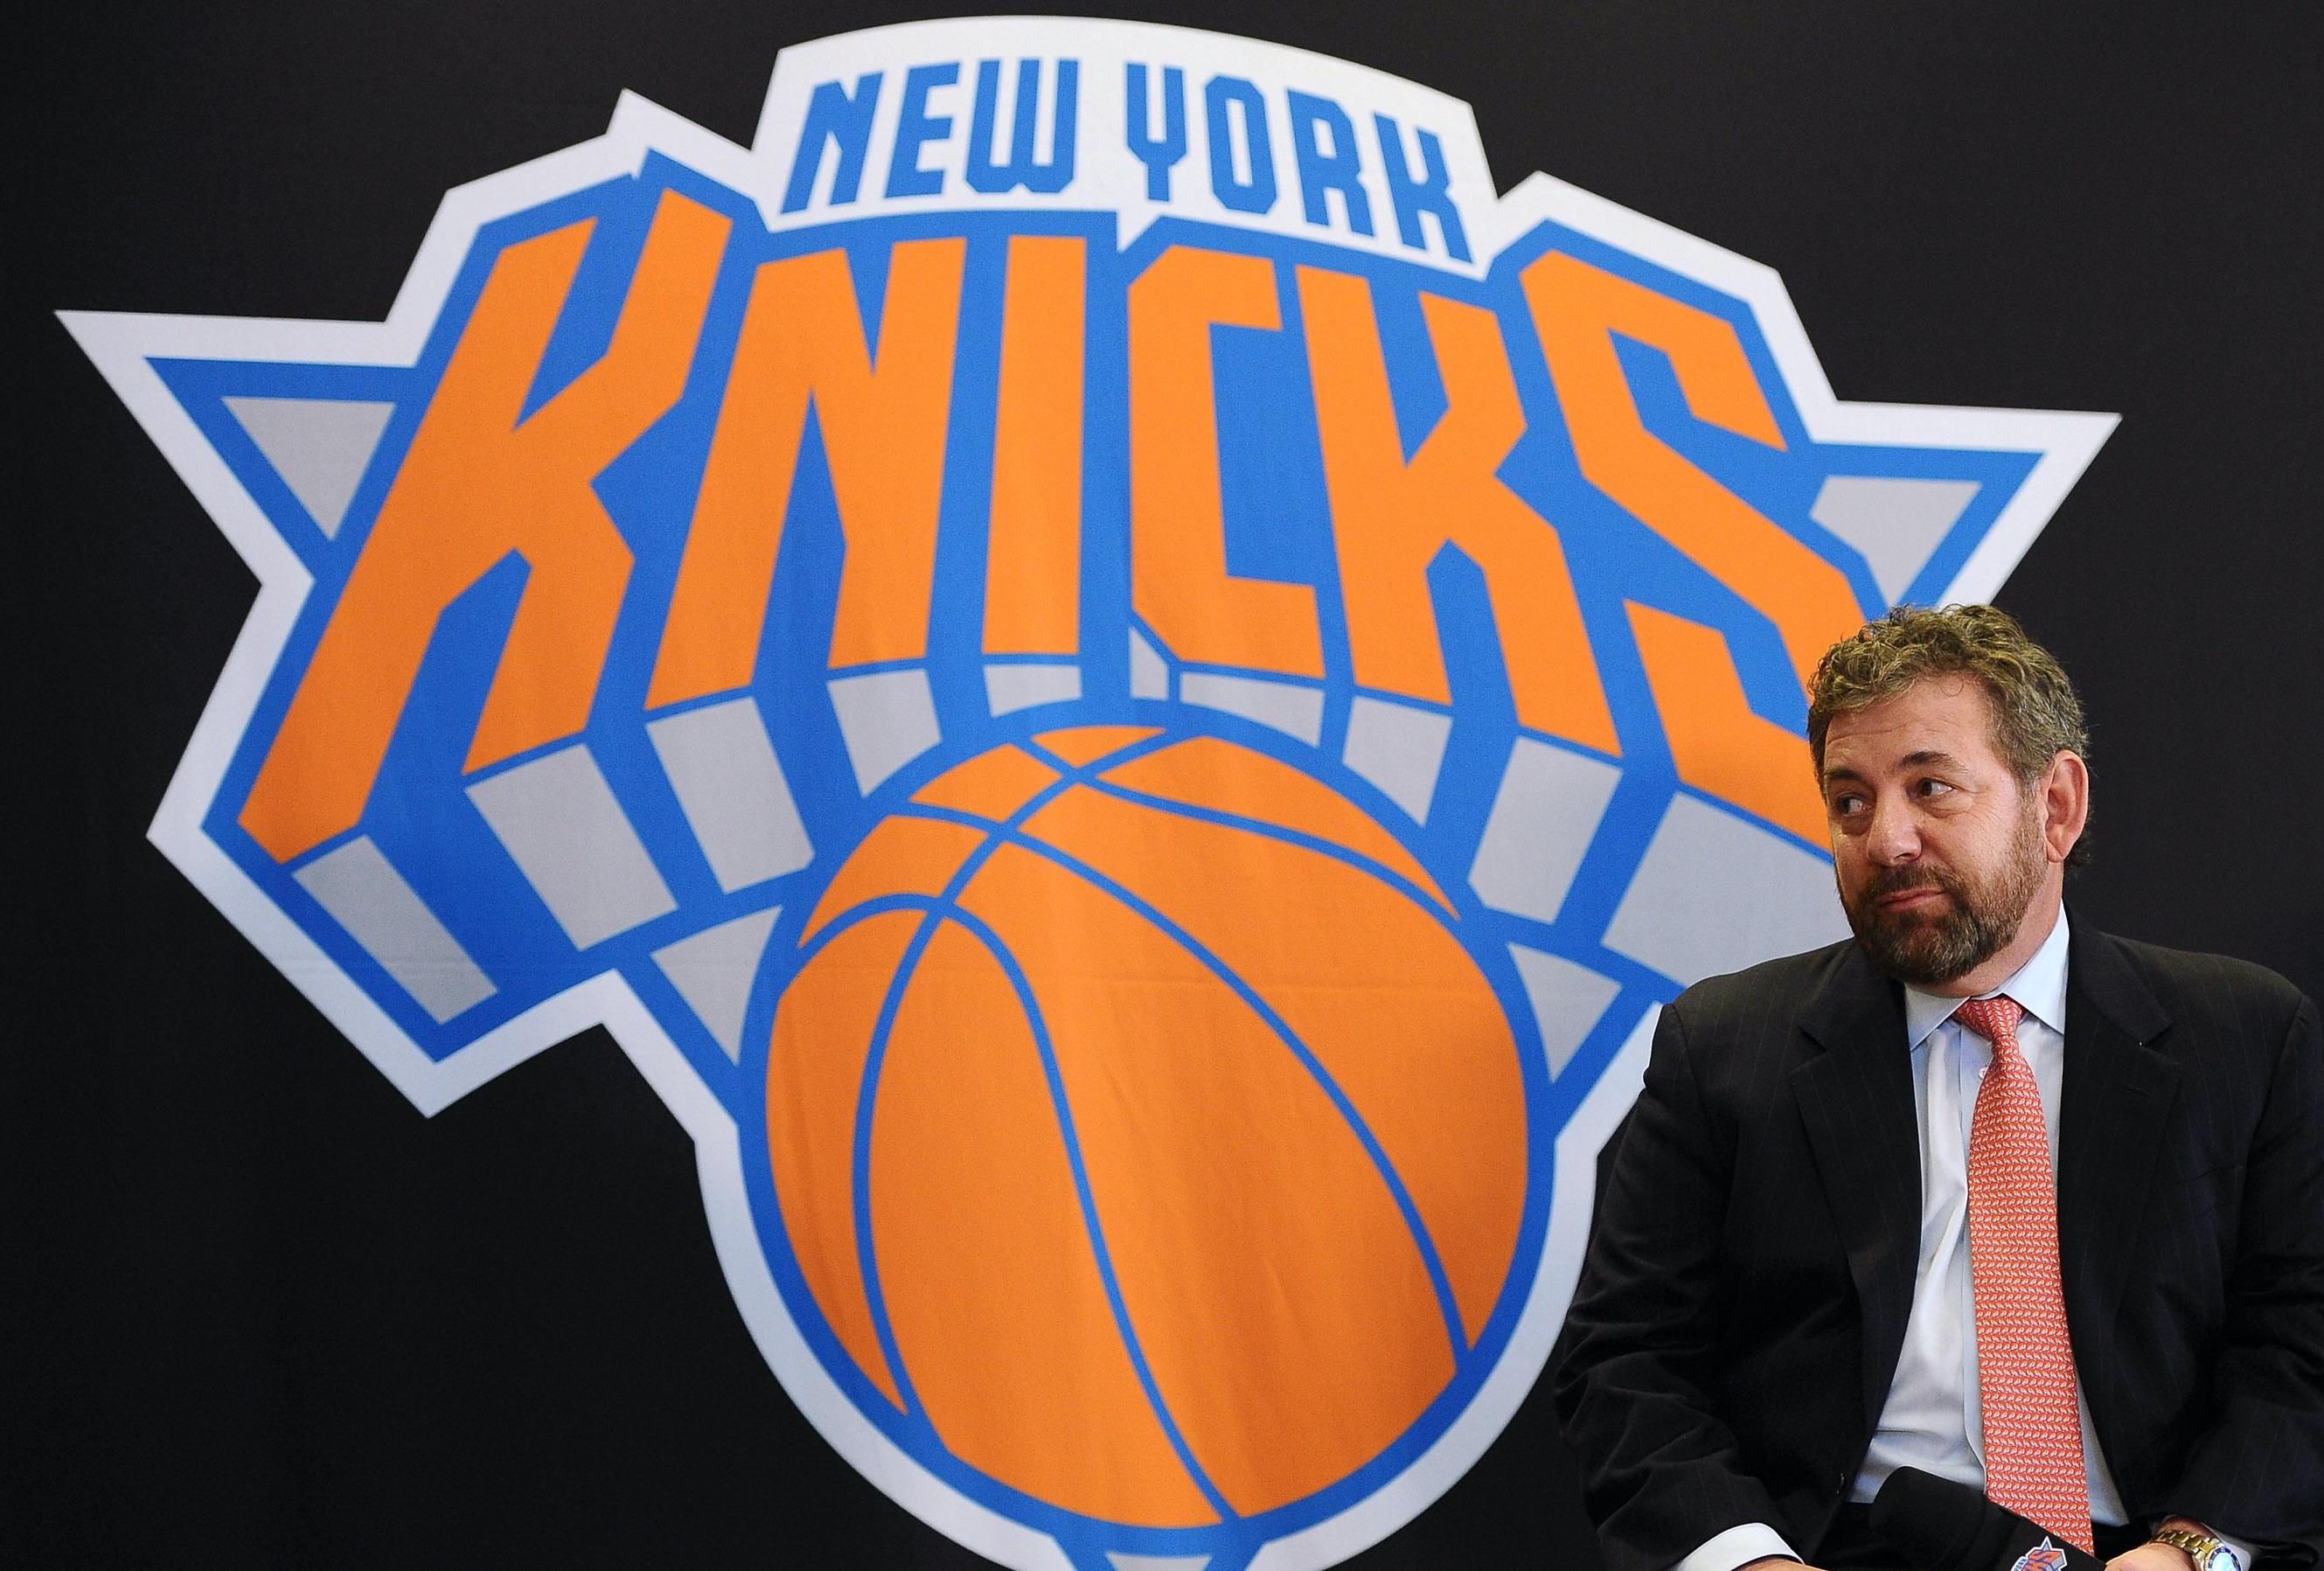 James Dolan sits next to a big Knicks logo.